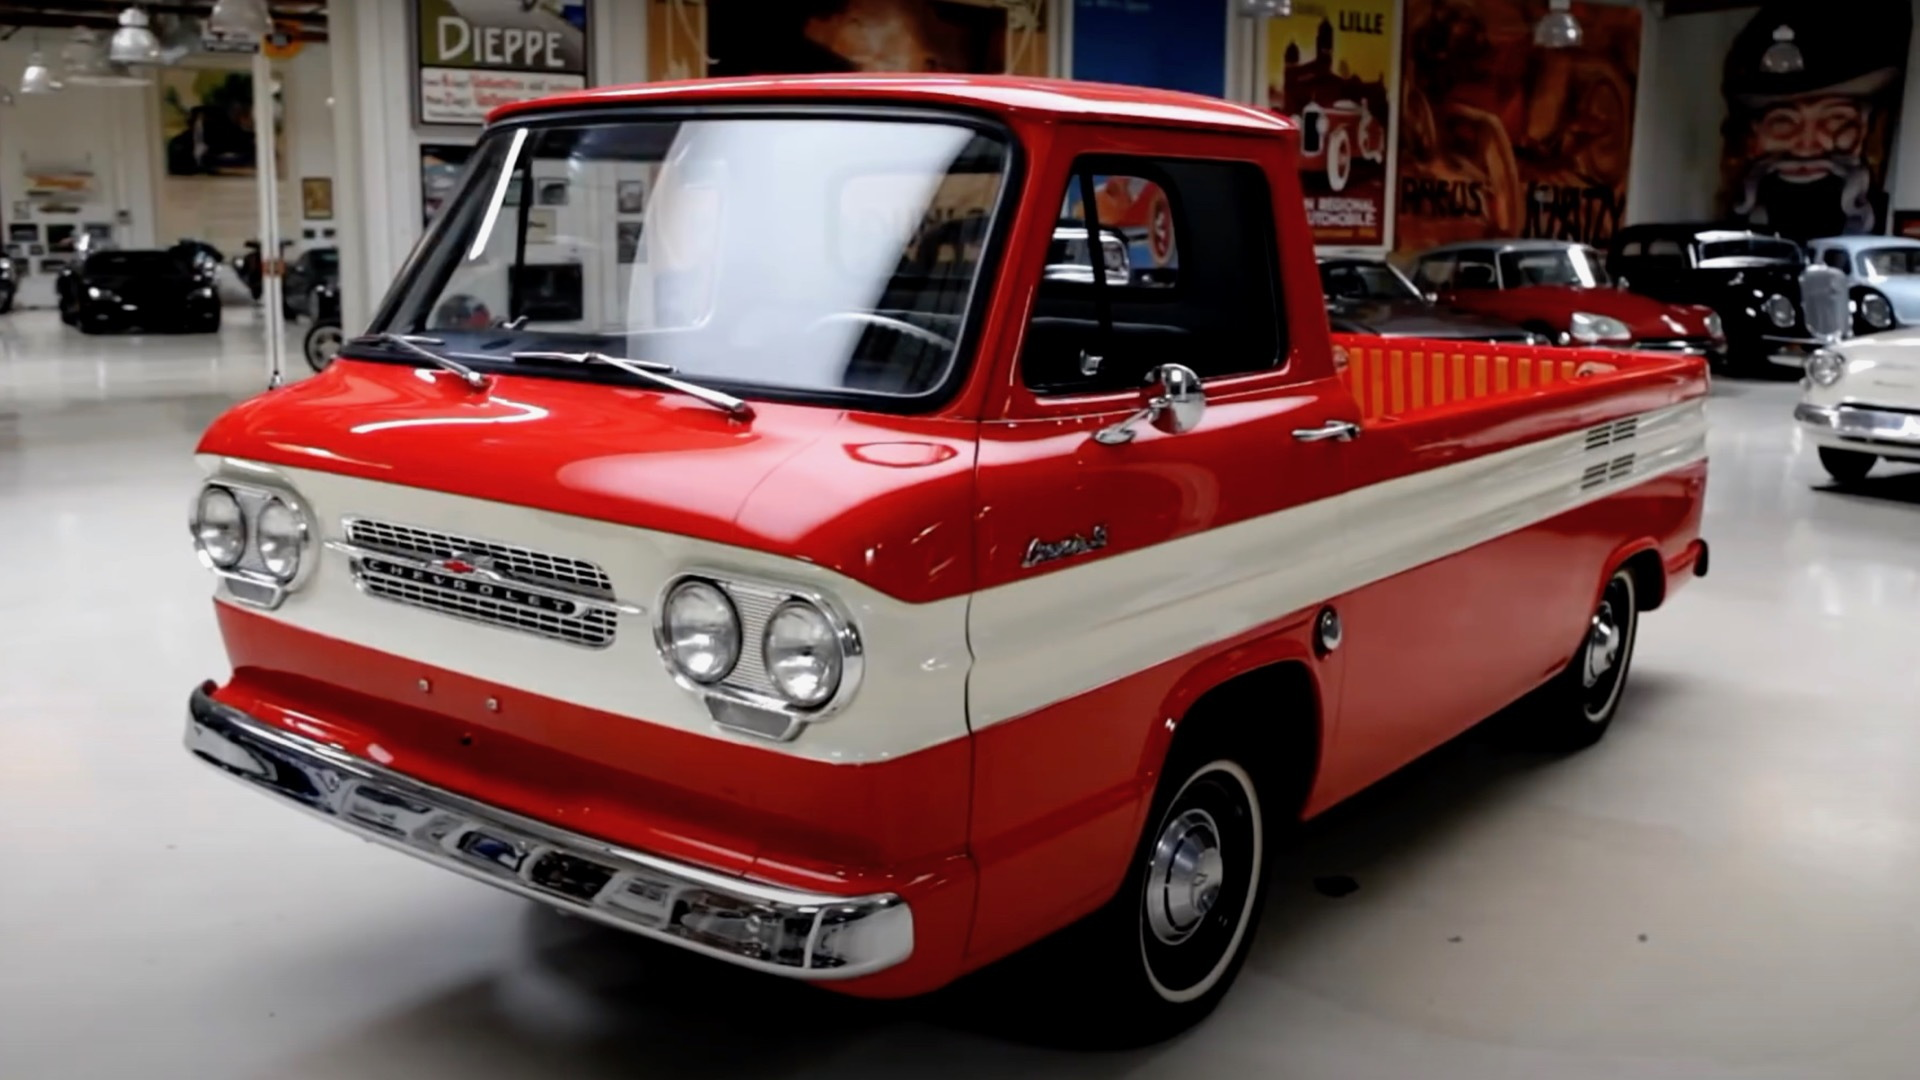 1961 Chevrolet Corvair ramp side pickup truck on Jay Leno's Garage